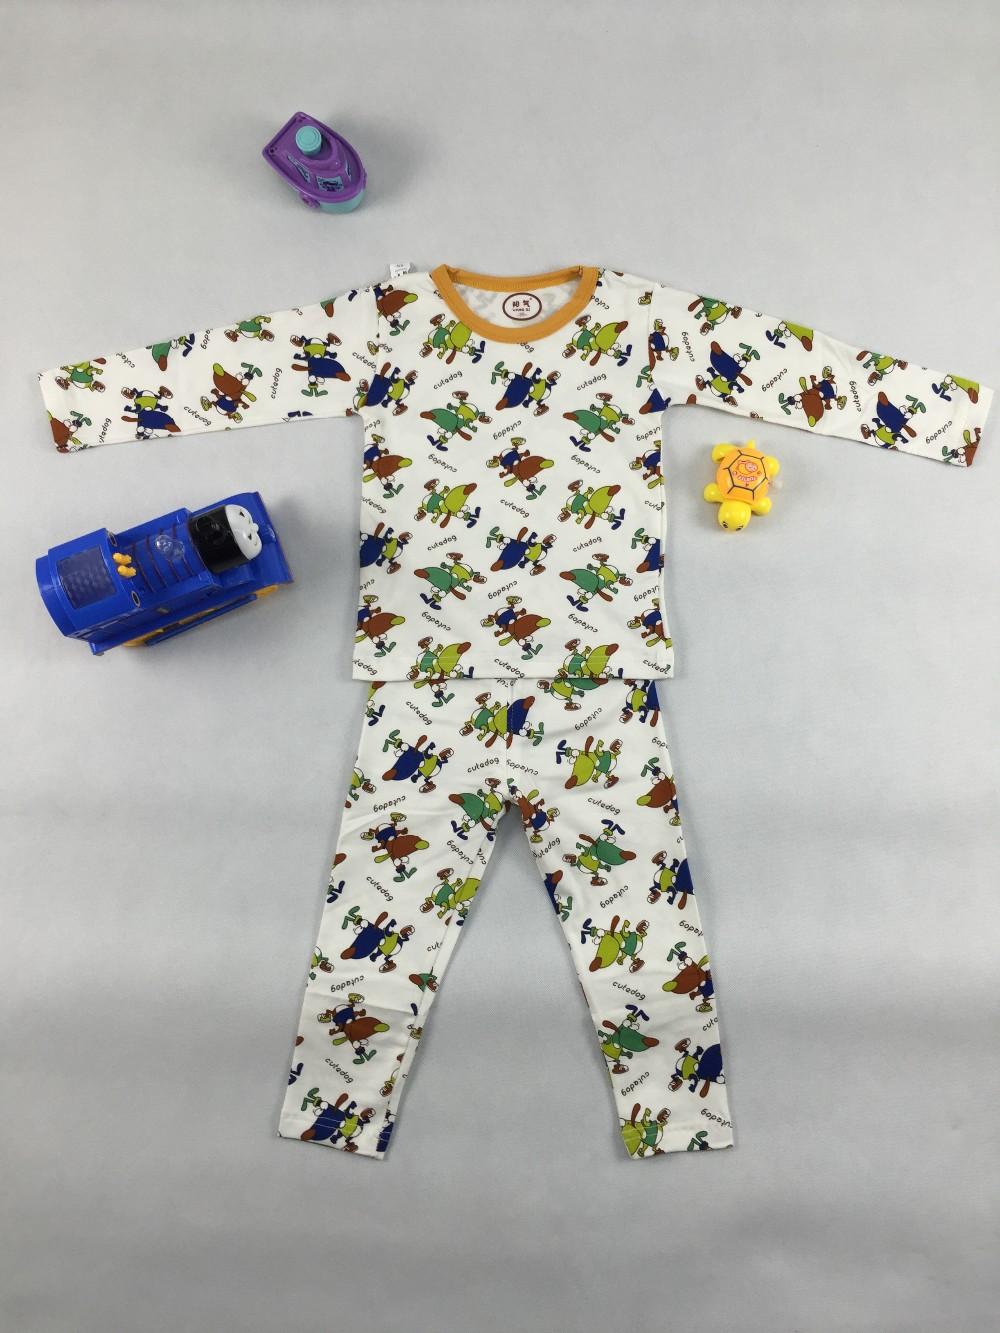 Kids Pijamas Sleepwear Boys Pyjamas Kids Pajamas Sets 2-10T Kids Clothes Nightwear Homewear Toddler Clothes Garcon Suits